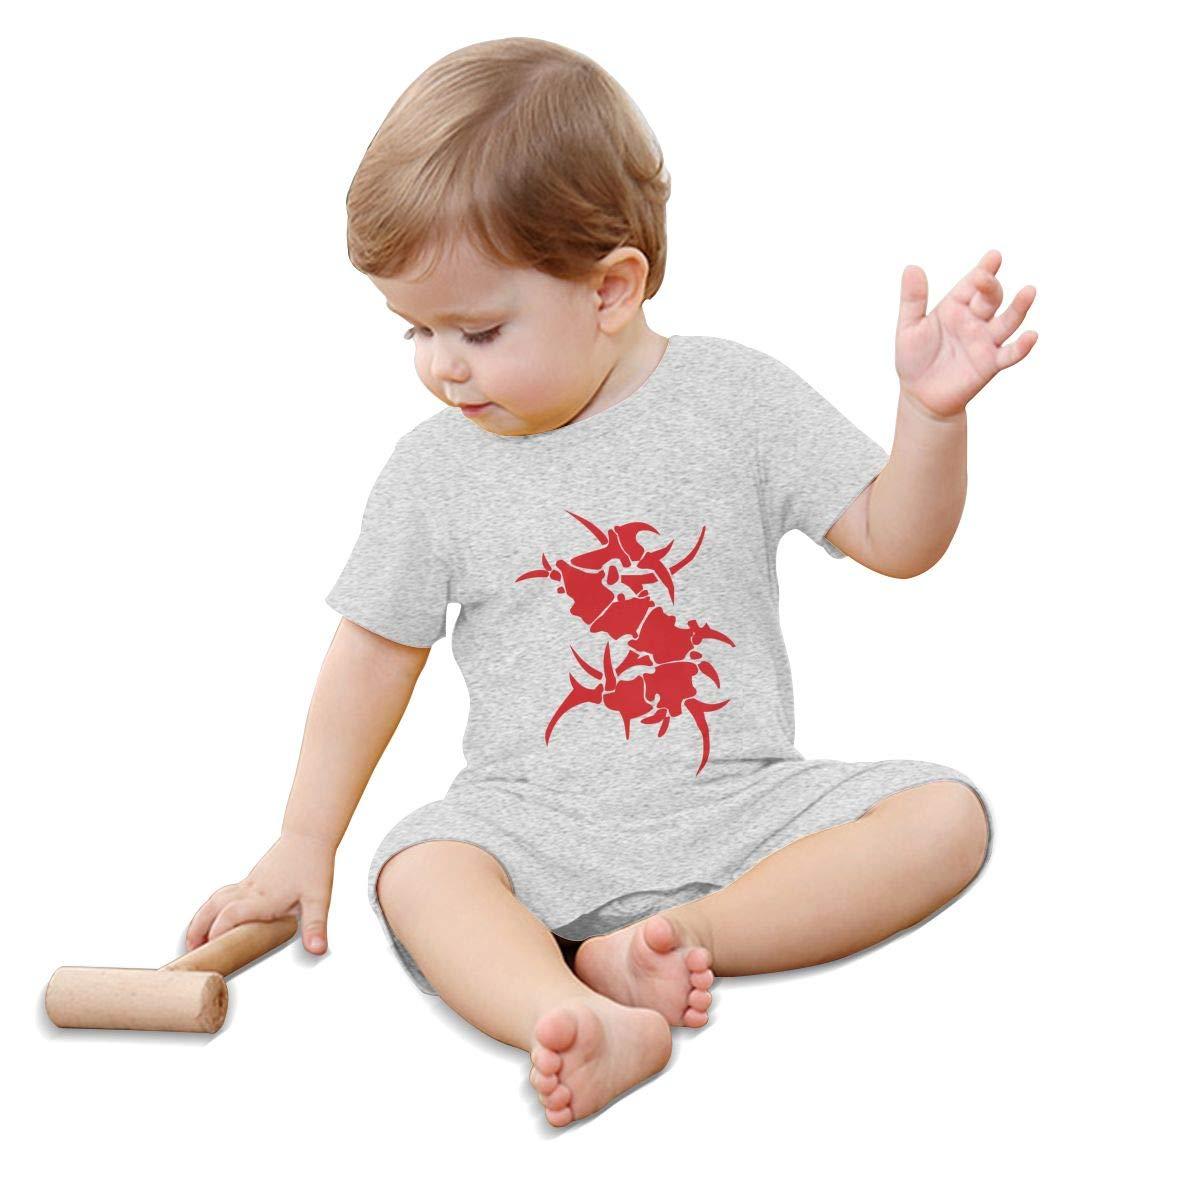 WangSiwe Sepultura Infant Boy Girl Short Sleeve Jumpsuit Summer Outfits